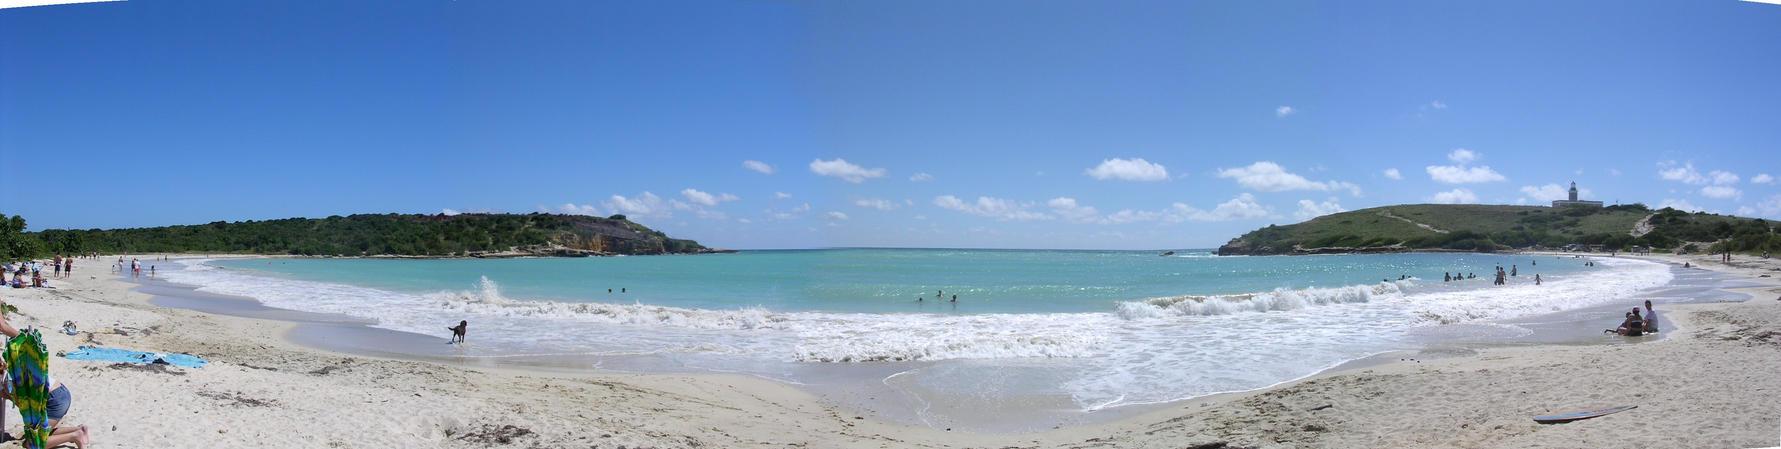 Playa Sucia by osoroco